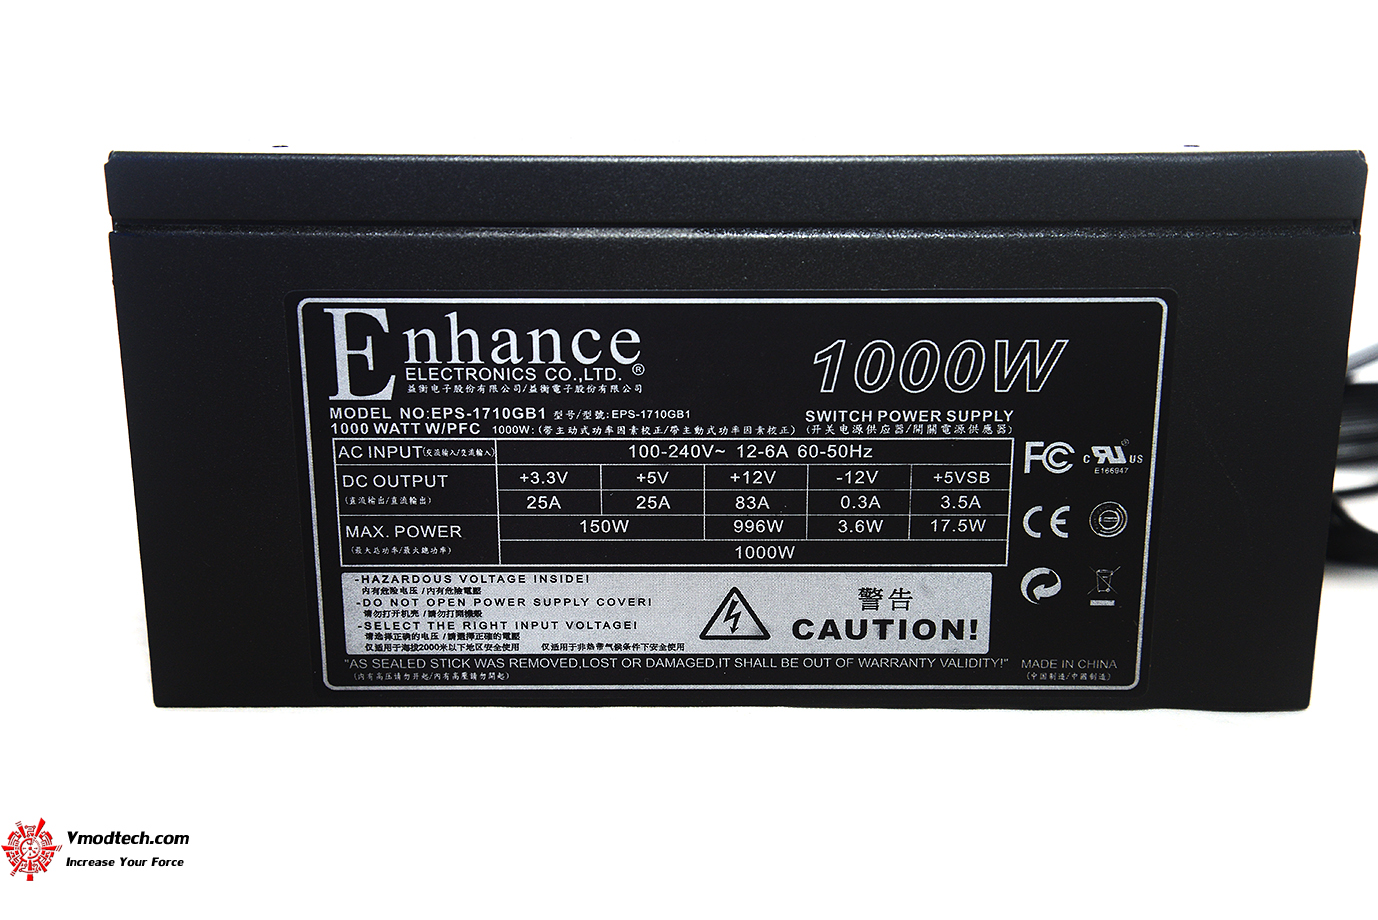 dsc 7026 ENHANCE POWER SUPPLY 1000W EPS 1710 GB1 REVIEW